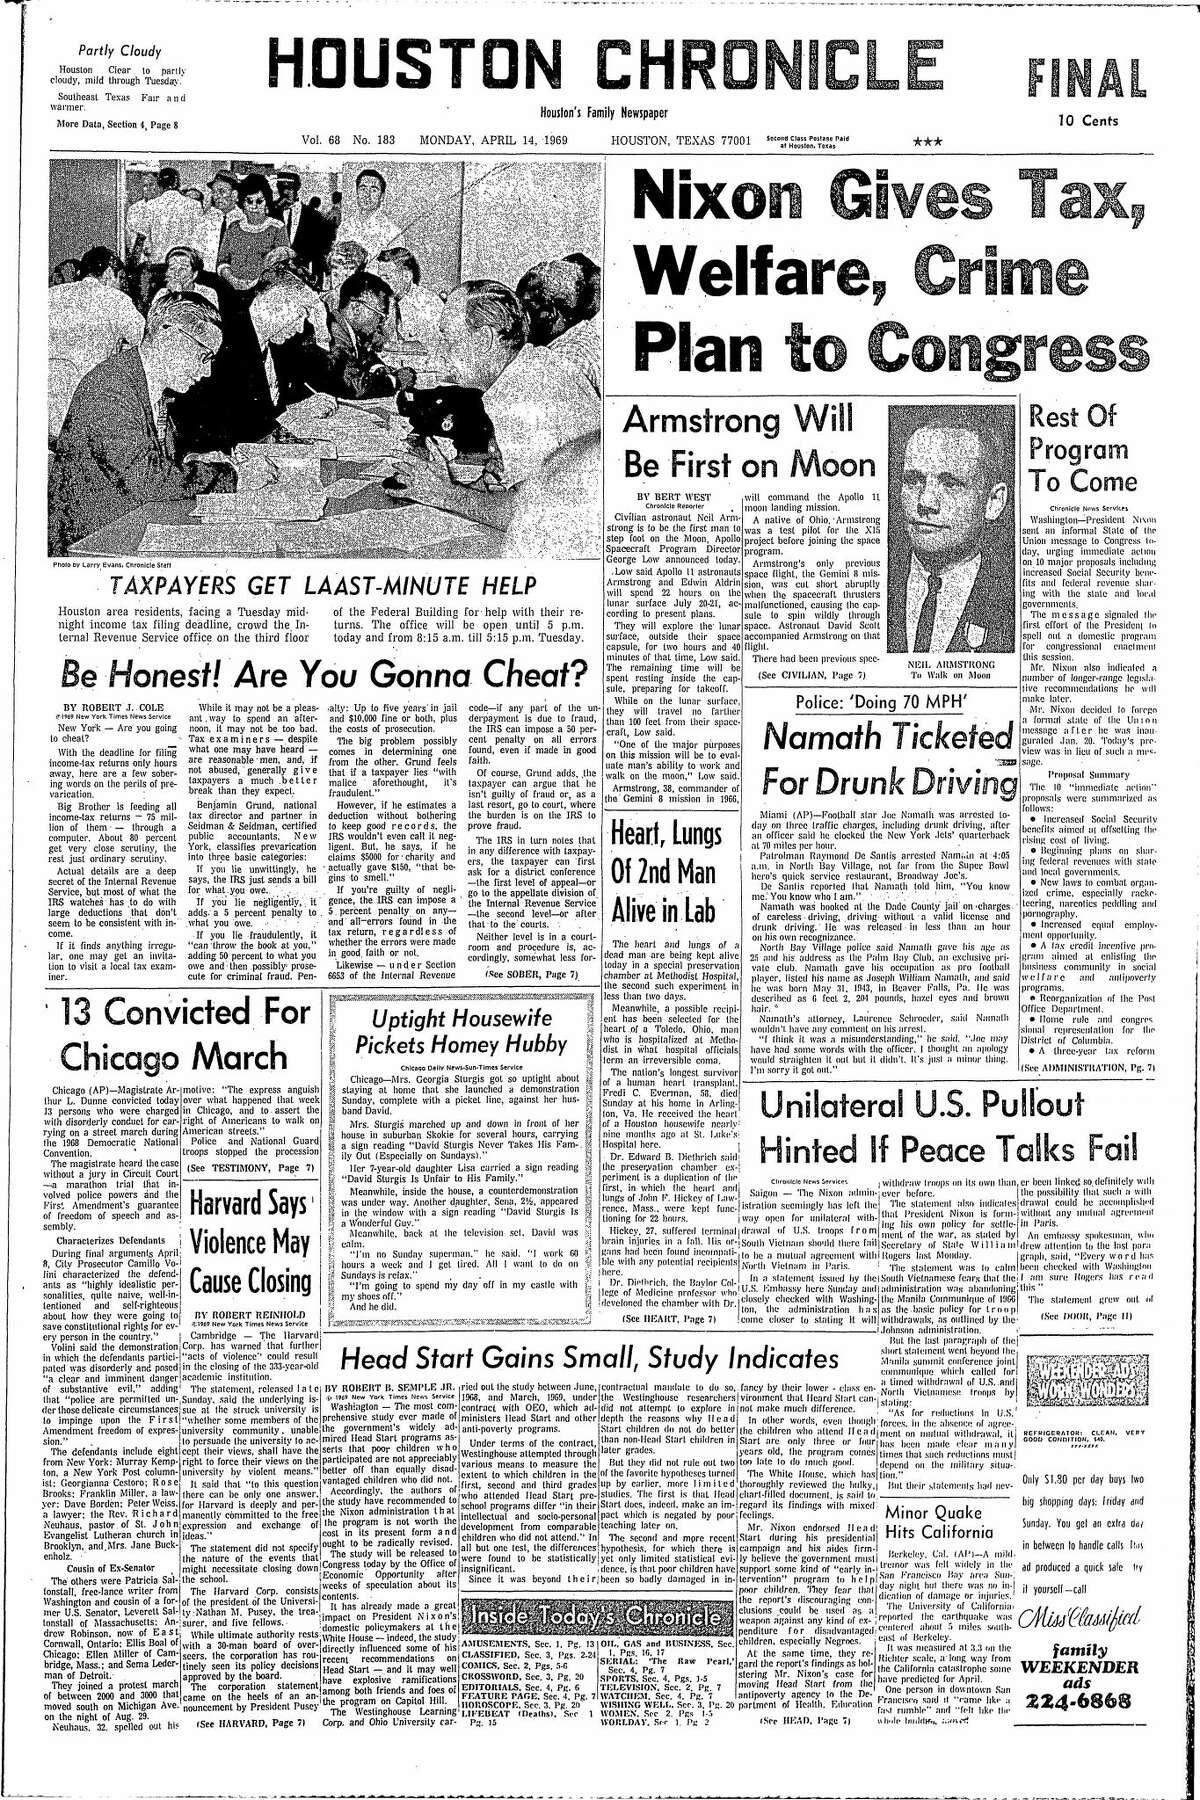 April 14, 1969